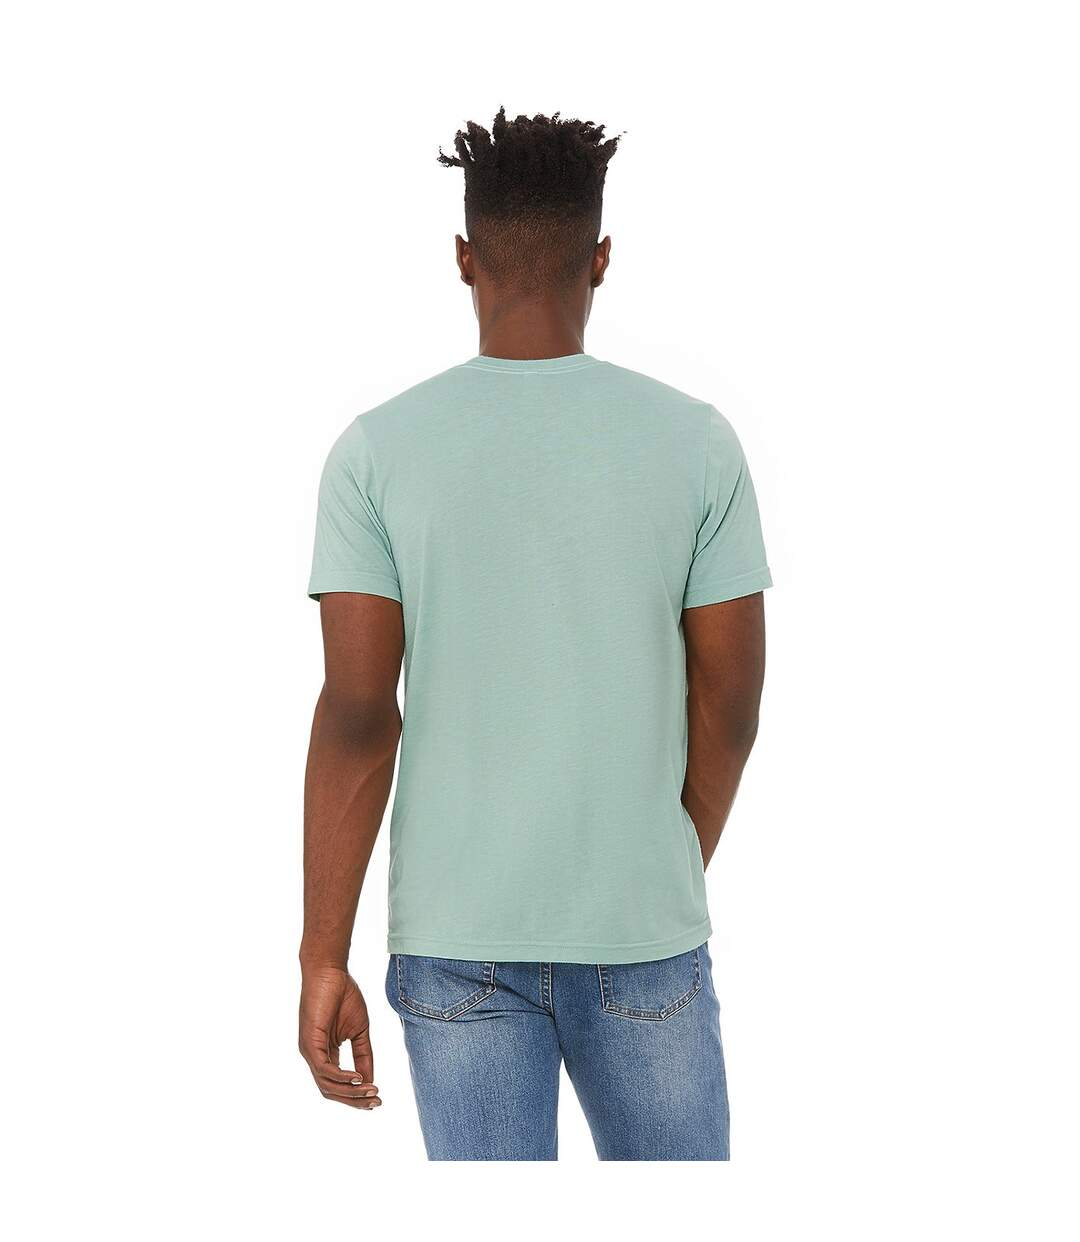 Canvas Mens Triblend Crew Neck Plain Short Sleeve T-Shirt (Dusty Blue Triblend) - UTBC2596